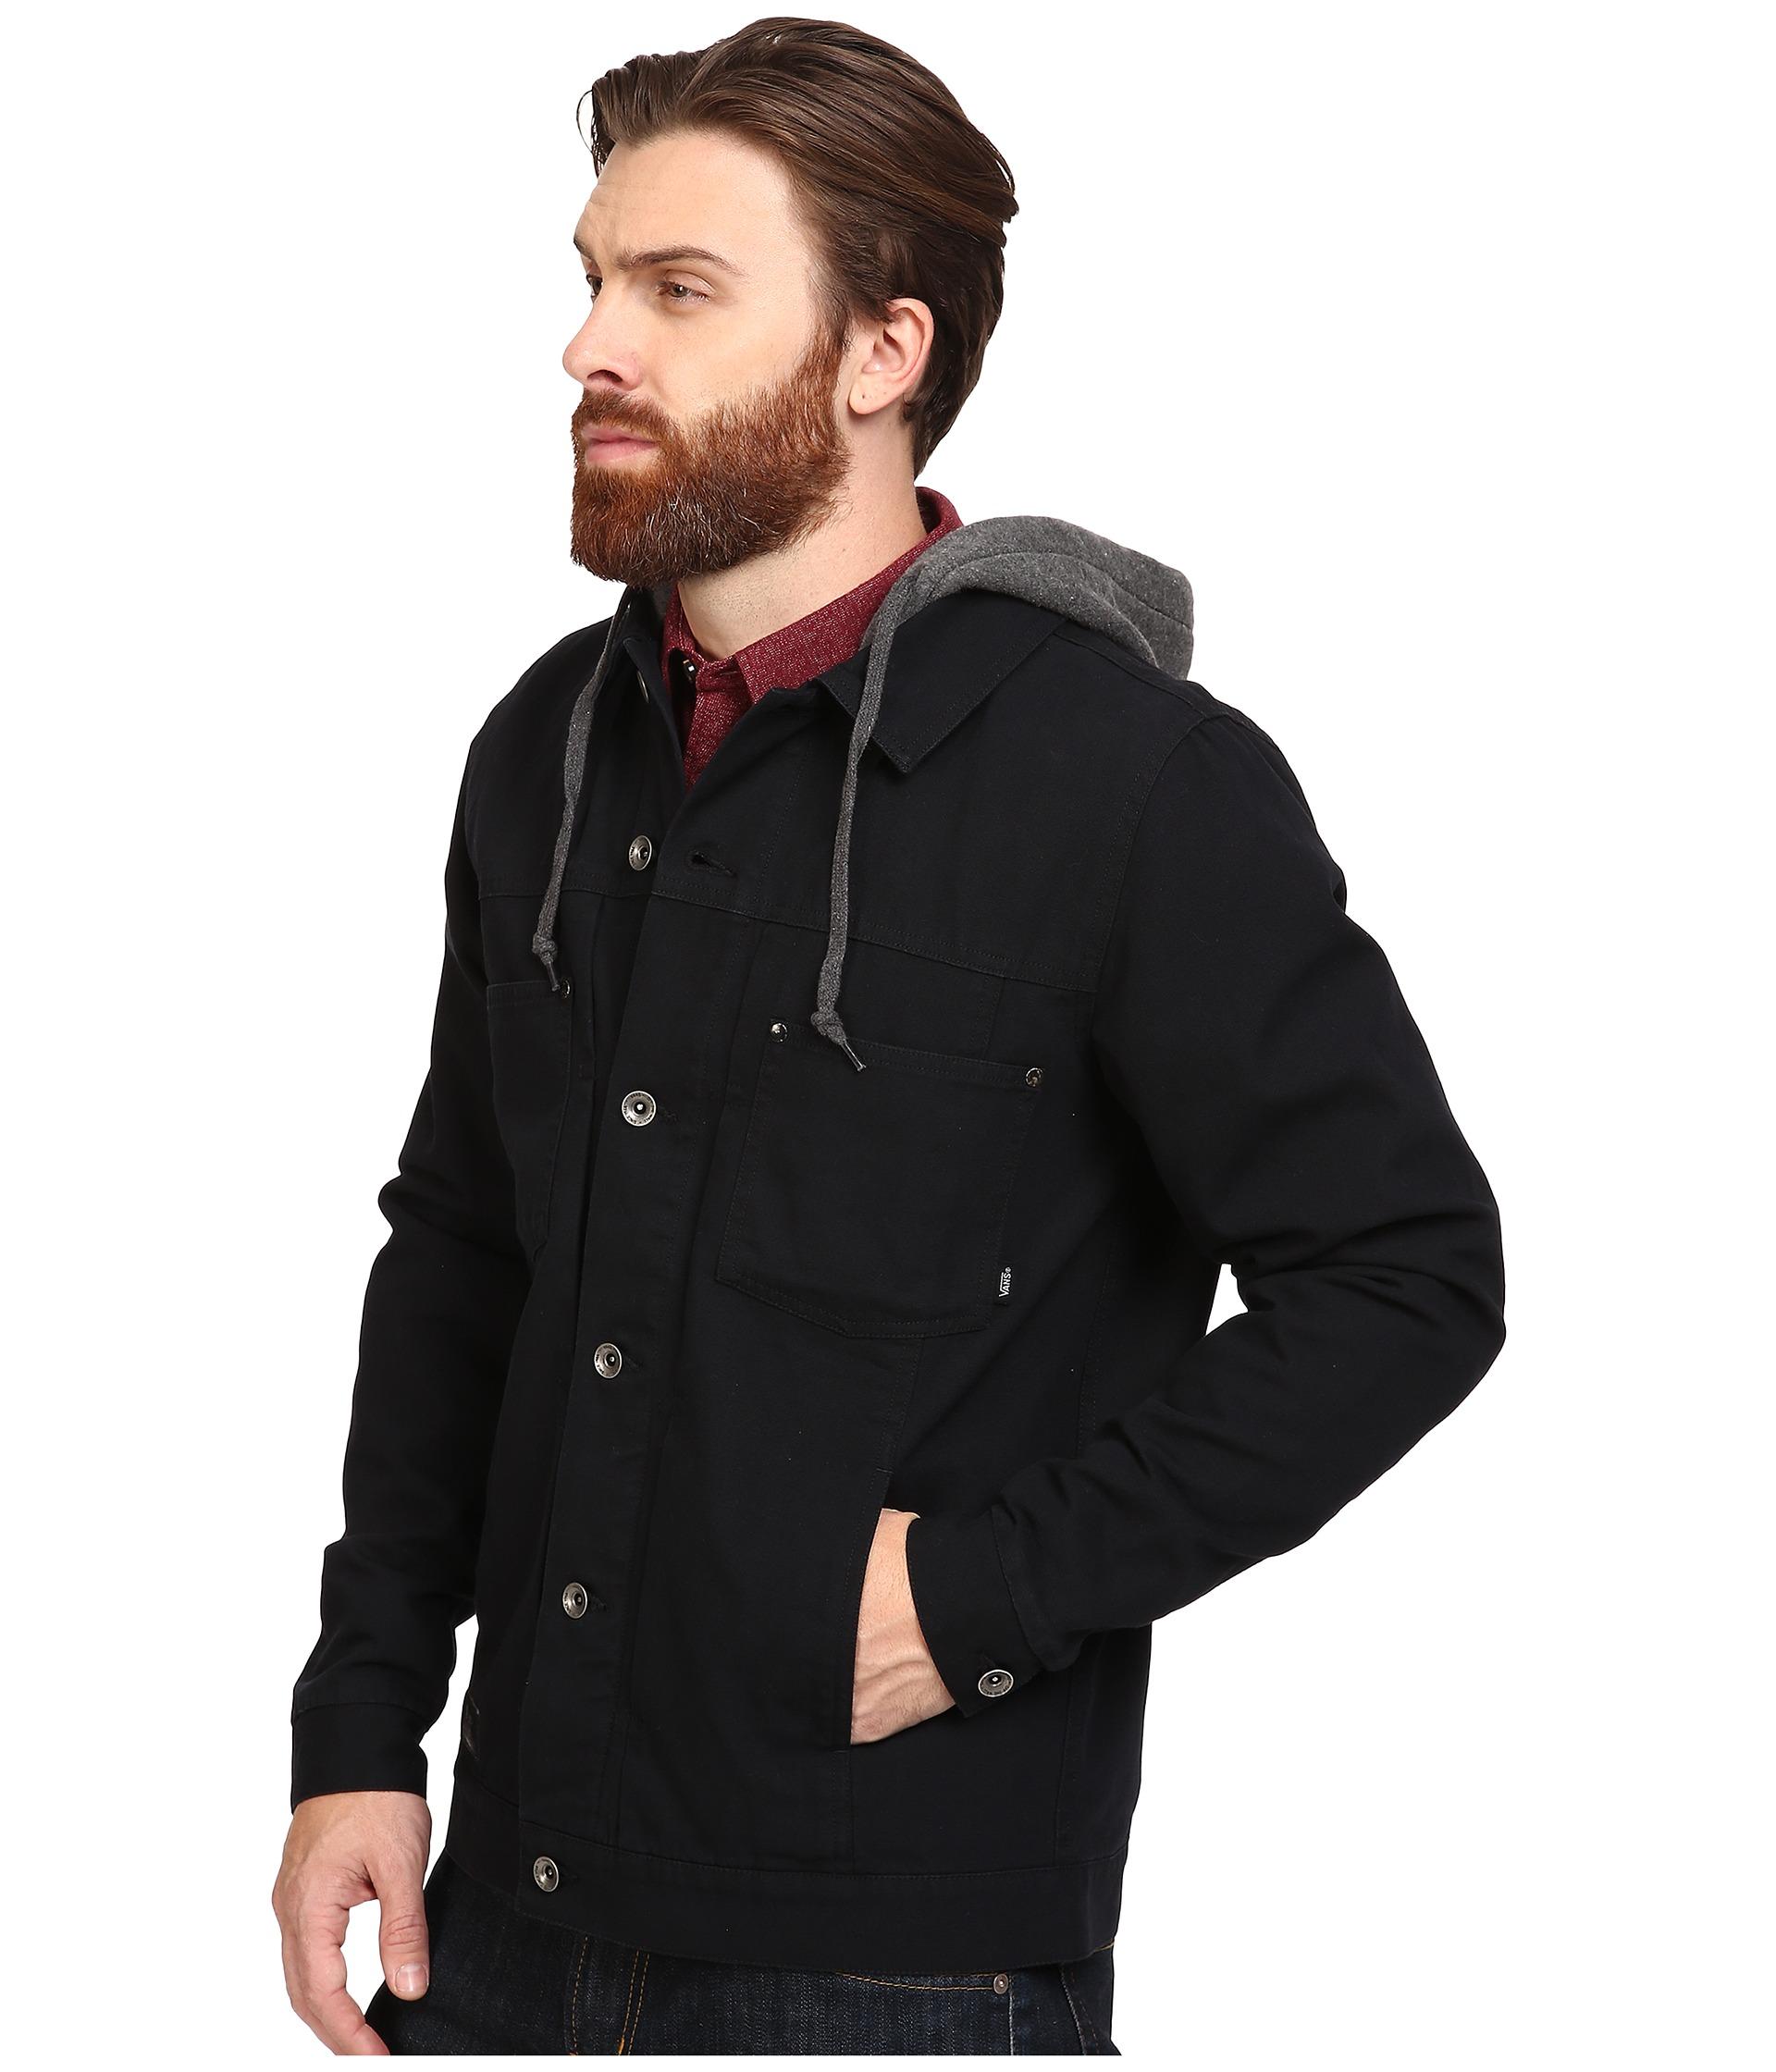 calpine black single men Columbia calpine interchange jacket - men's sage/black past season color the columbia men's calpine interchange jacket is ready for all of them.